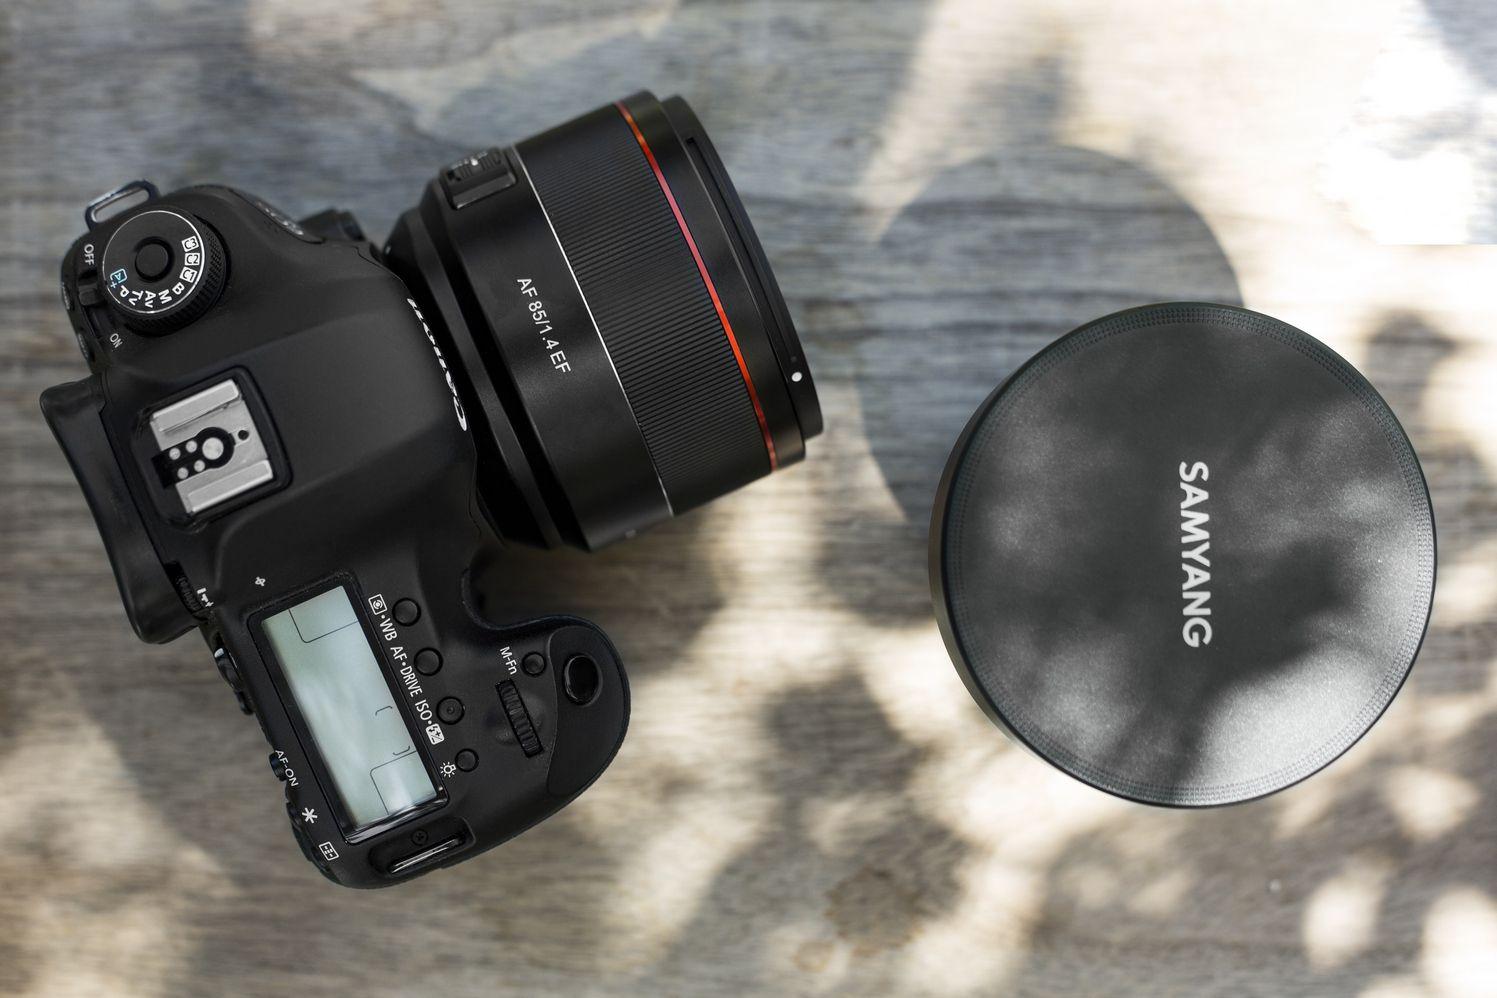 Объектив Samyang AF 85mm f/1.4 EF с камерой Canon